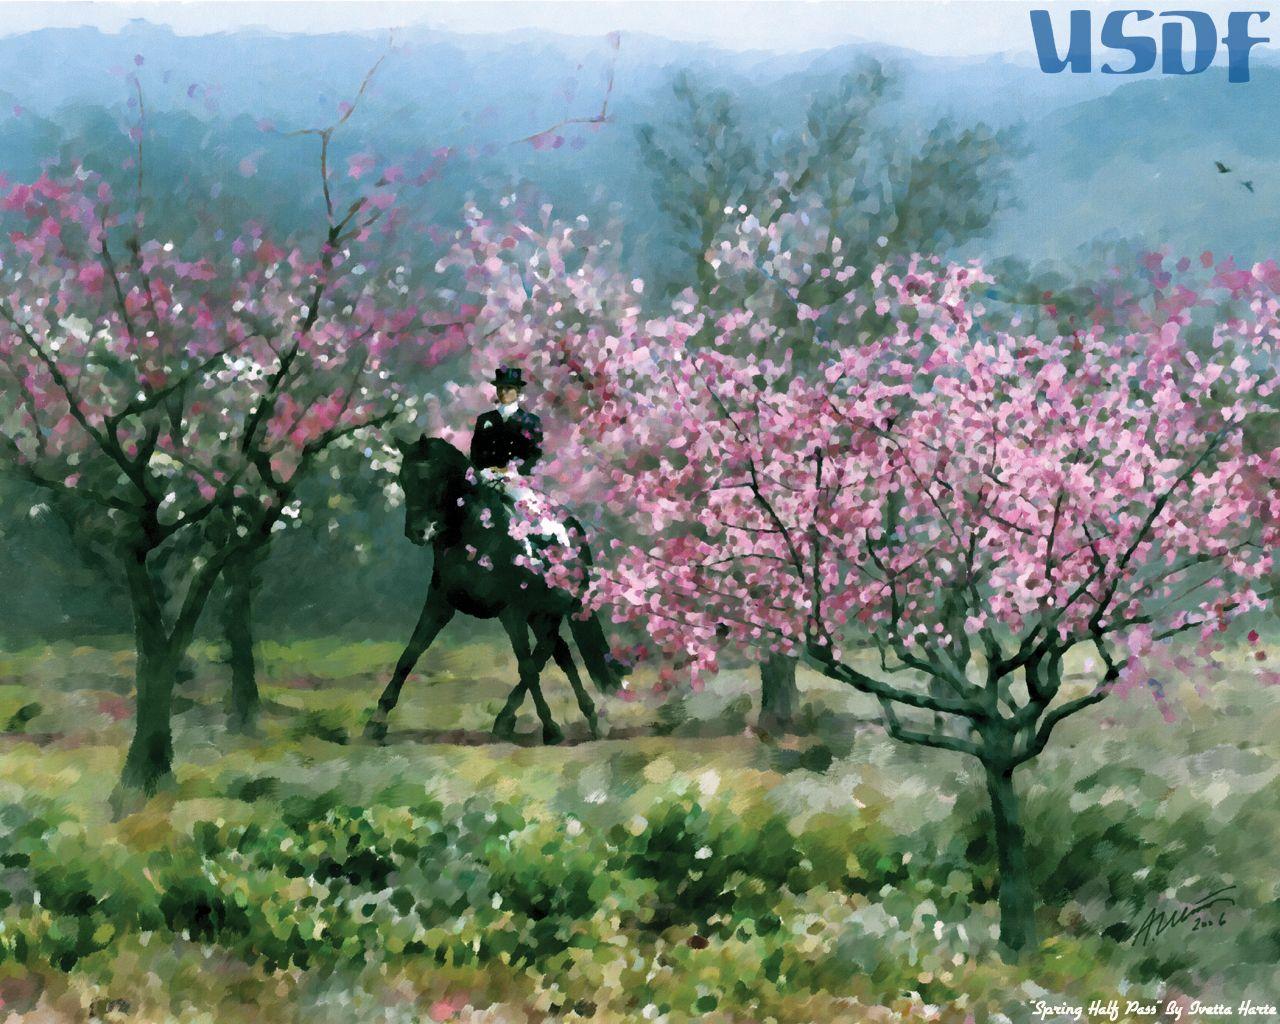 Download Wallpaper Horse Spring - 7ce77dc3427b9fccc6675af85cc621b8  Perfect Image Reference_356698.jpg